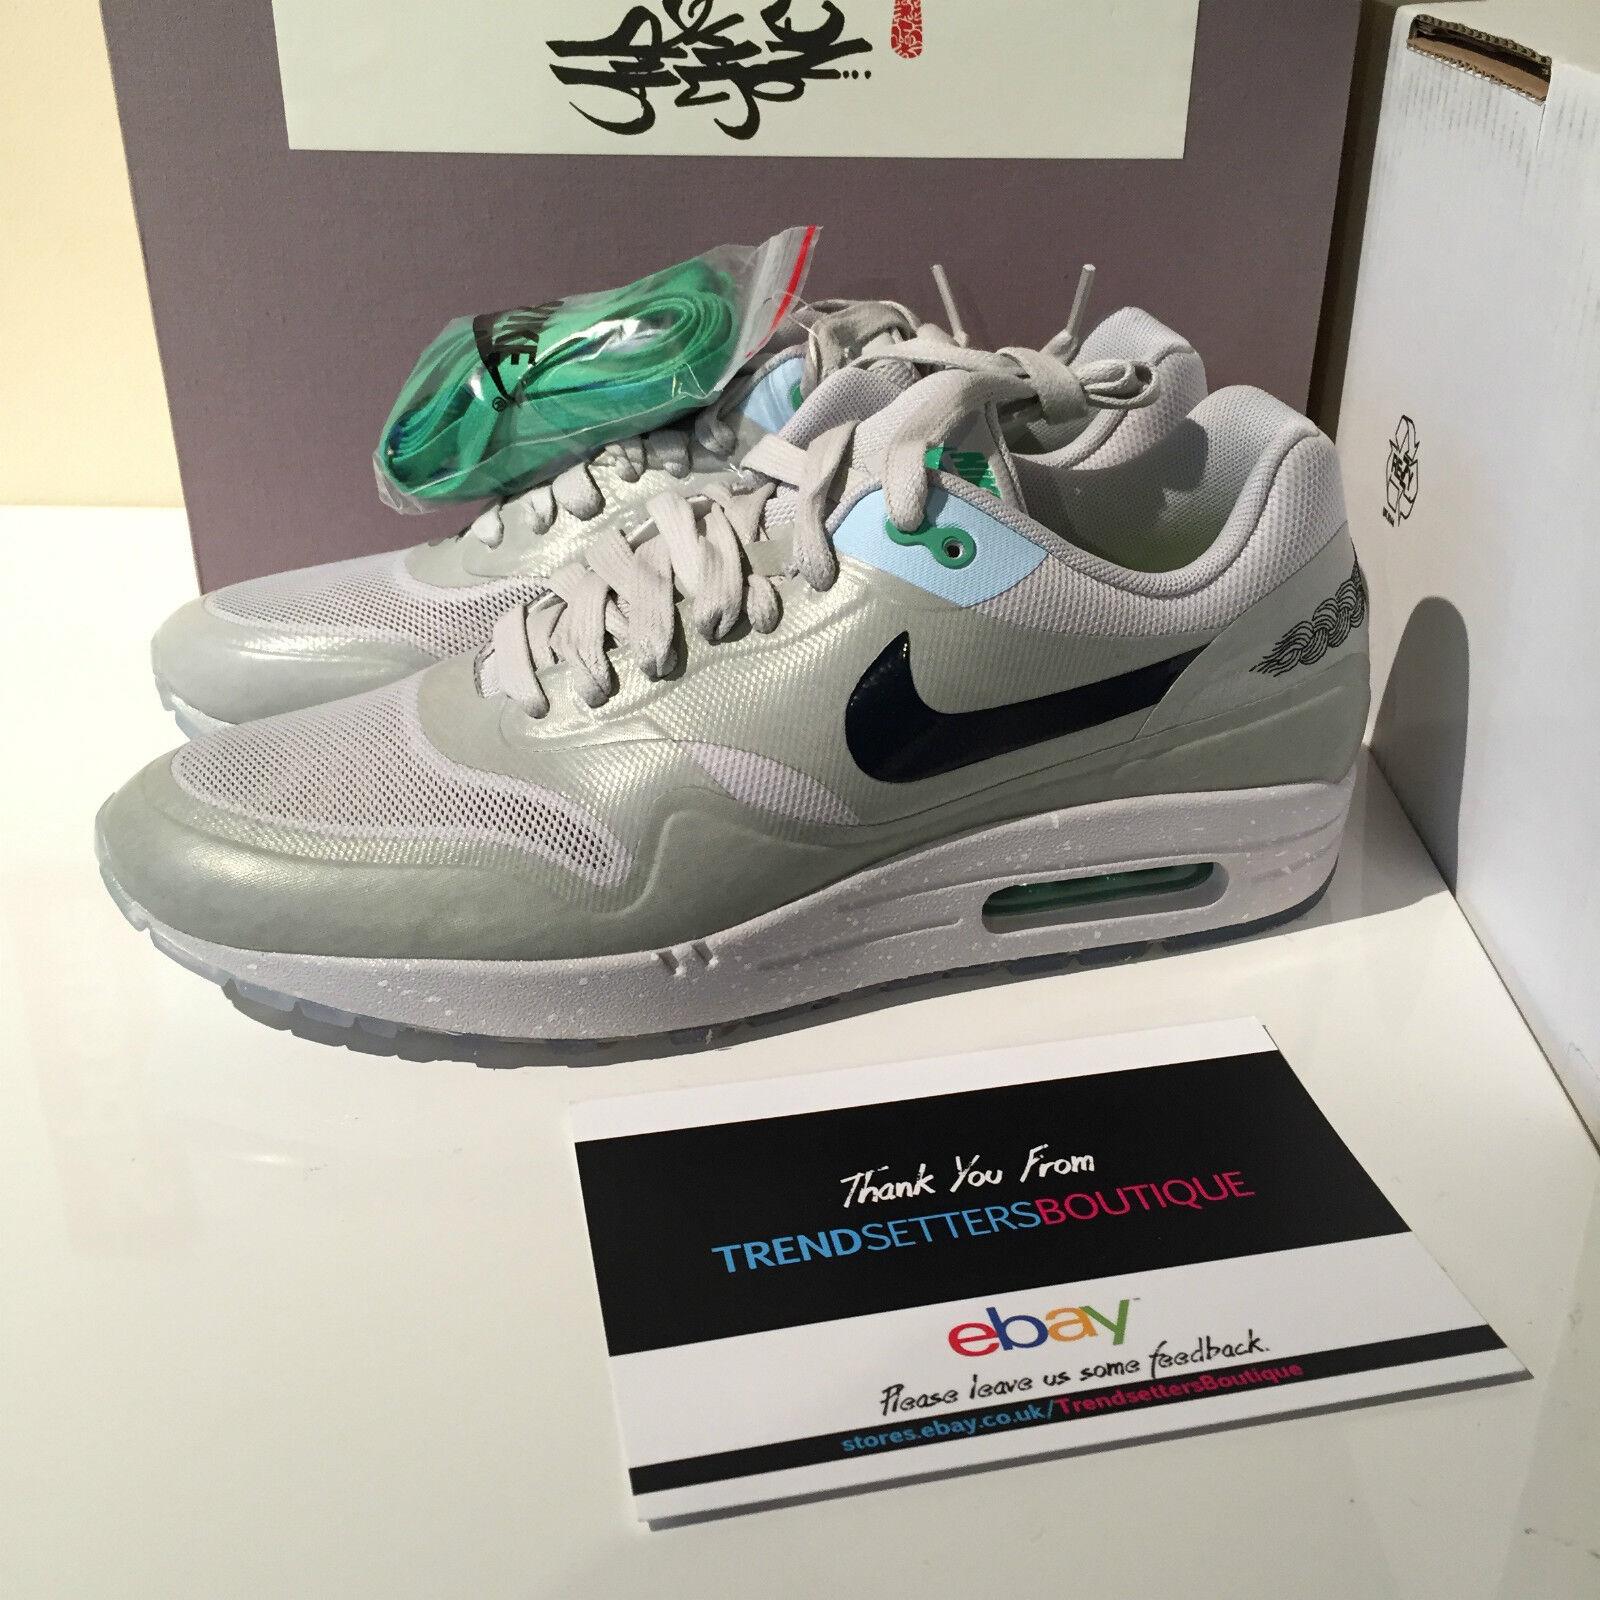 Nike air max 1 x coagulo sp il bacio della morte ii noi hyperfuse atmos 2013